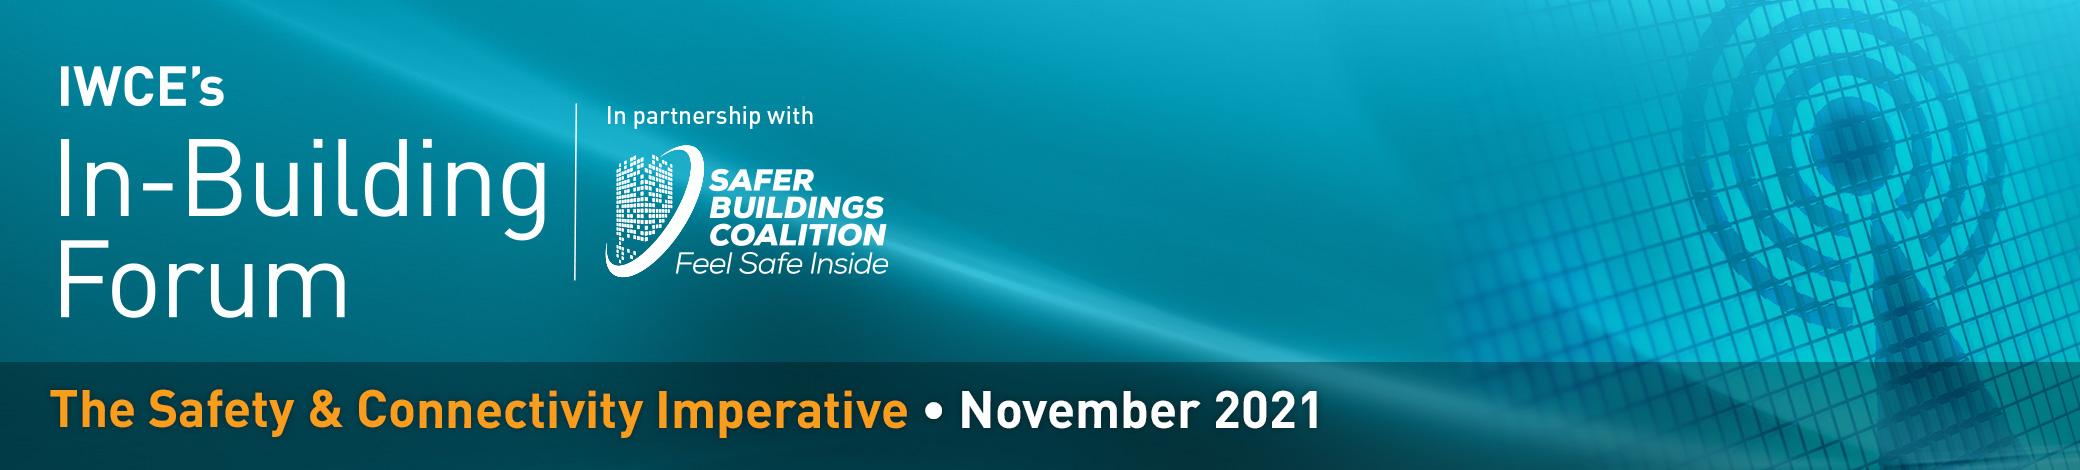 IWCE's In-Building Forum Updates